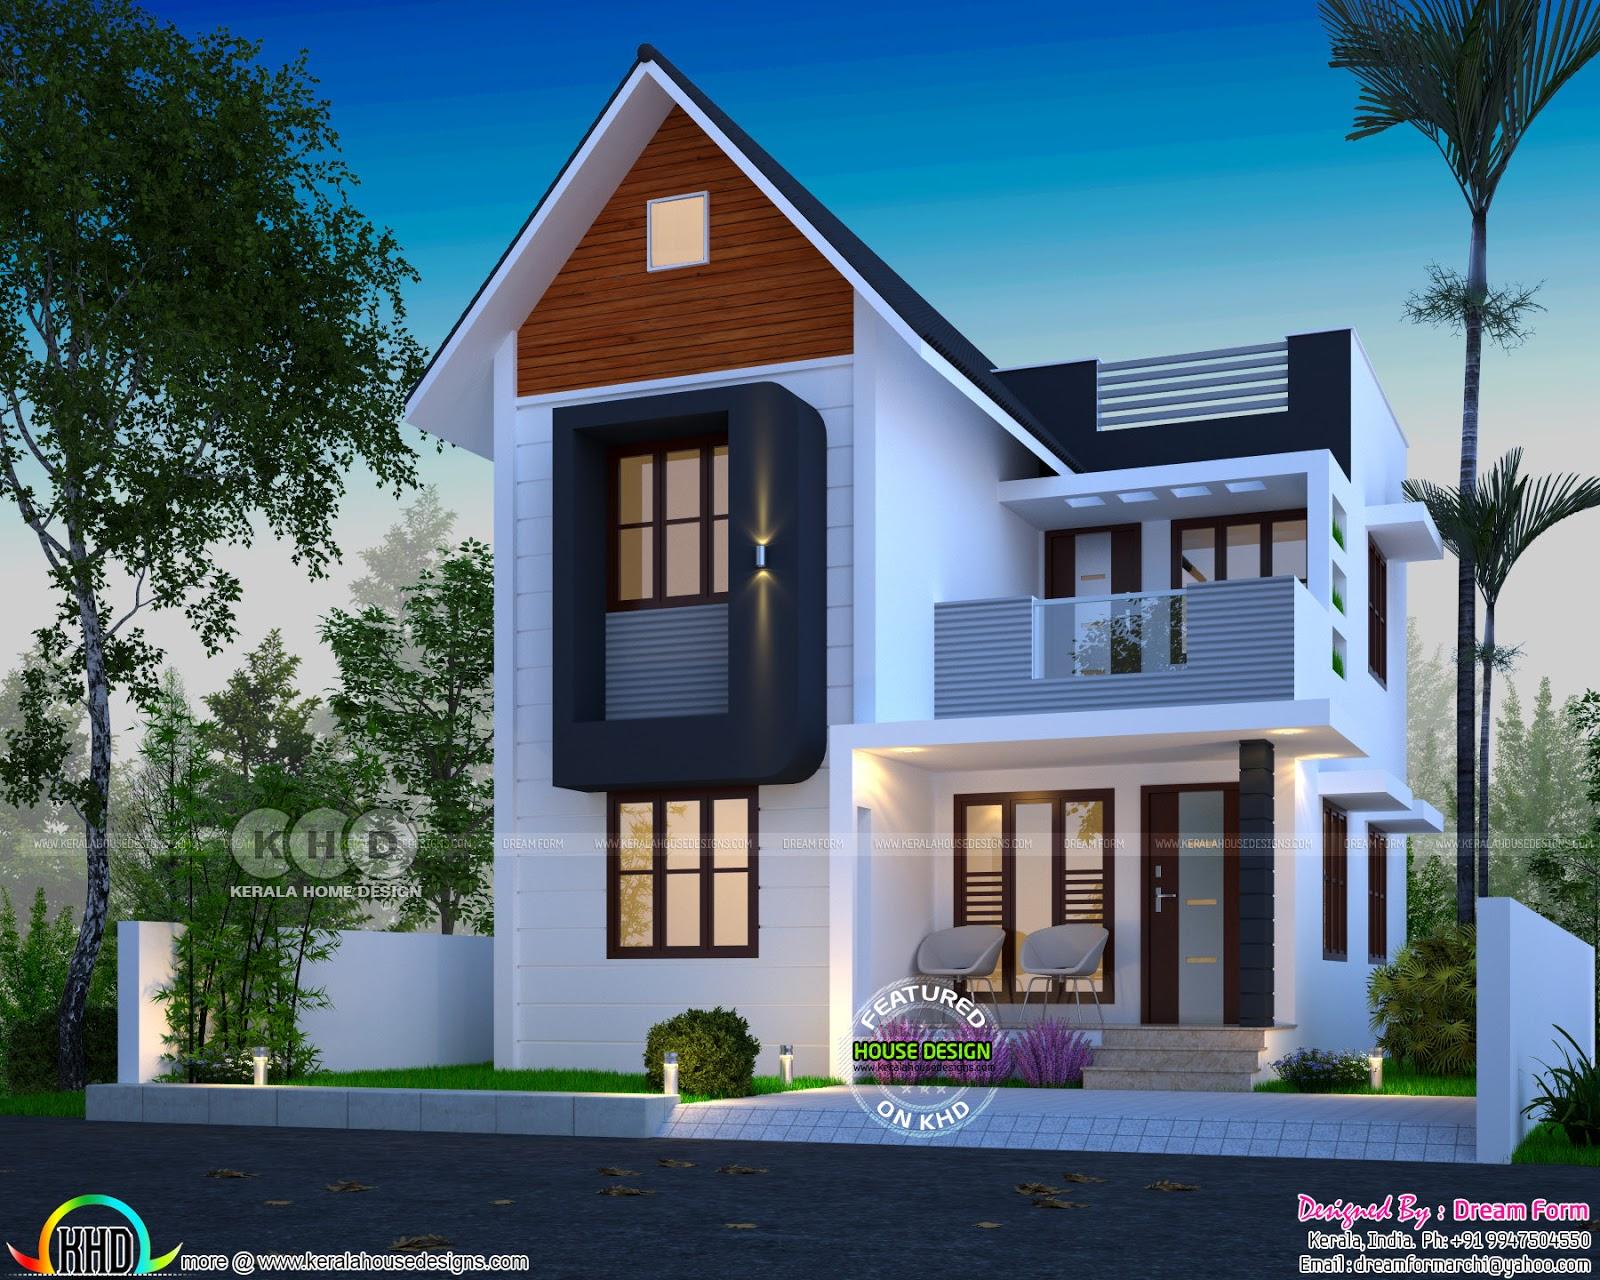 1413 Square Feet 4 Bedroom Modern House Kerala Home